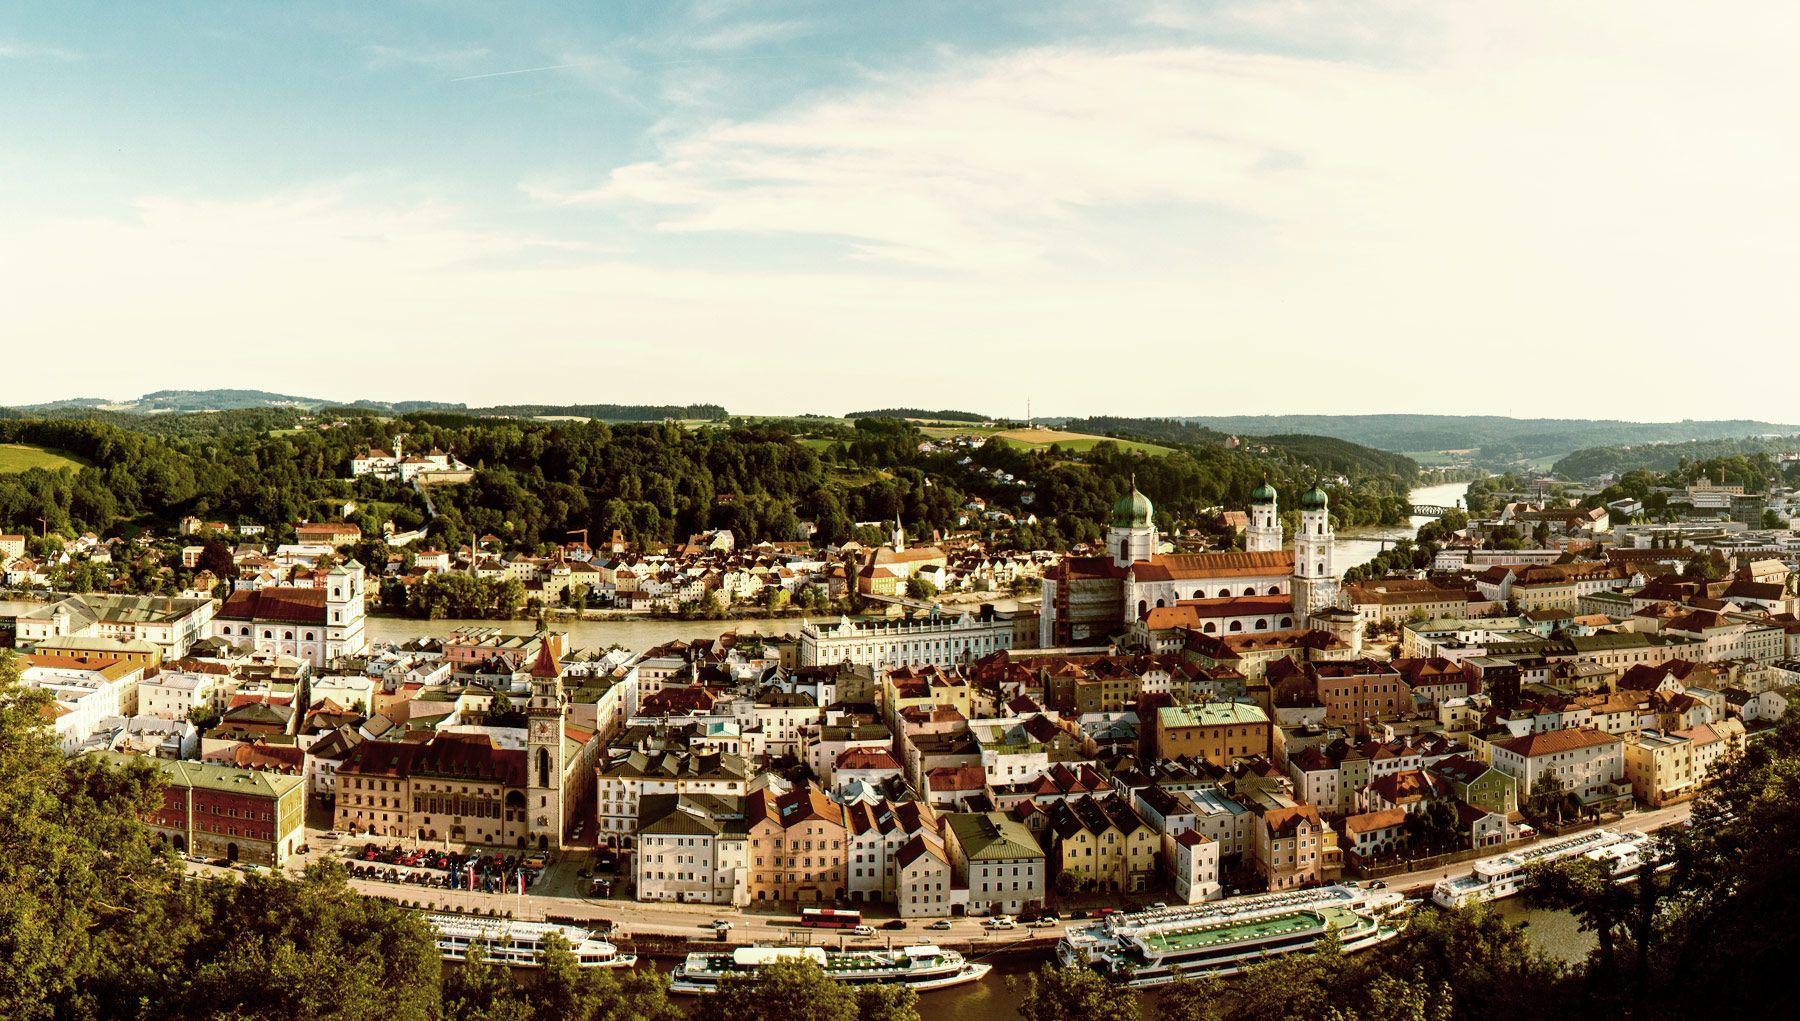 Start Das Oberhaus In Passau Speisekarte Karten Passau